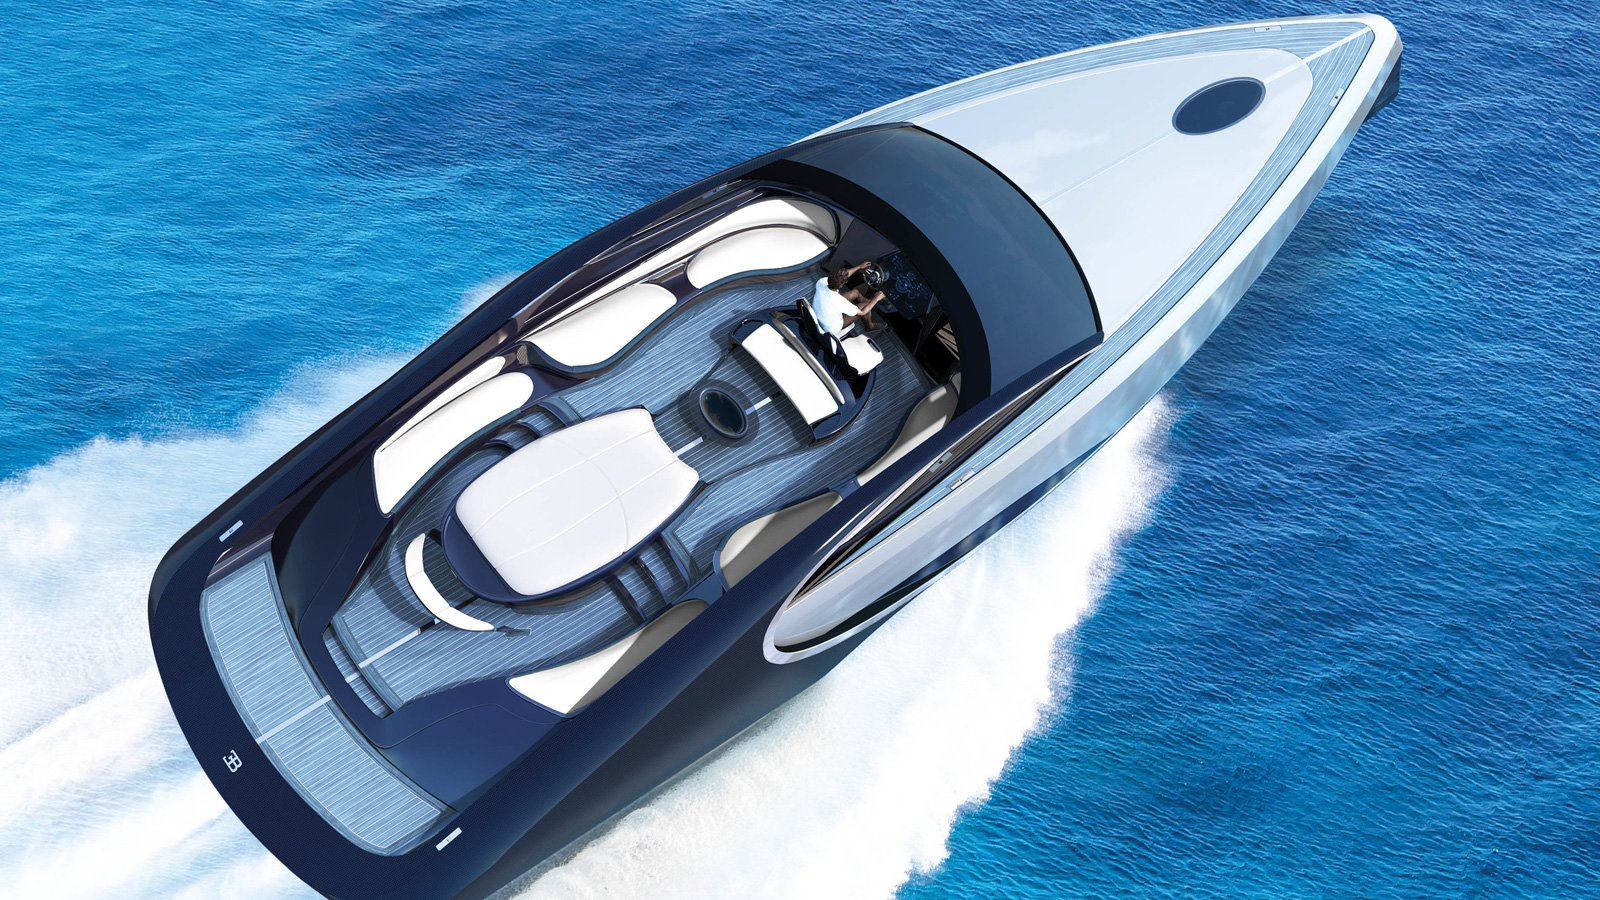 bugatti-niniette-66-yacht-07